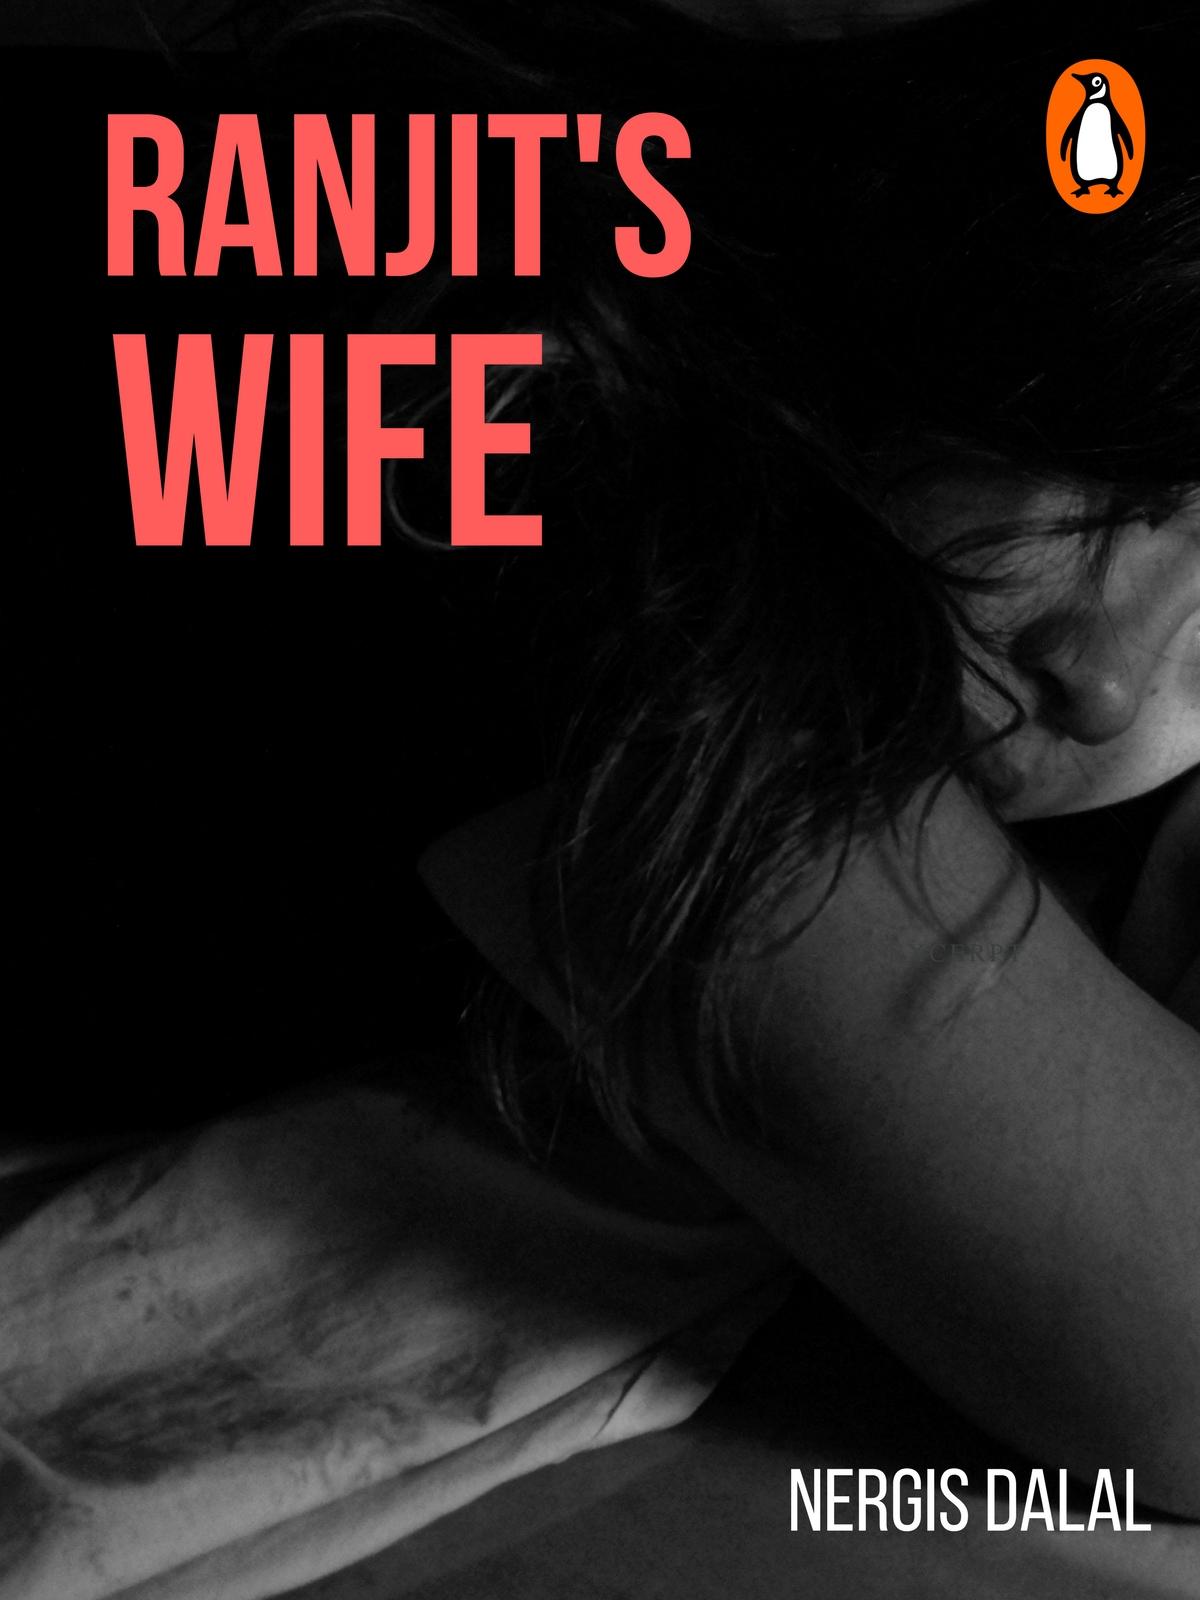 Ranjit's Wife